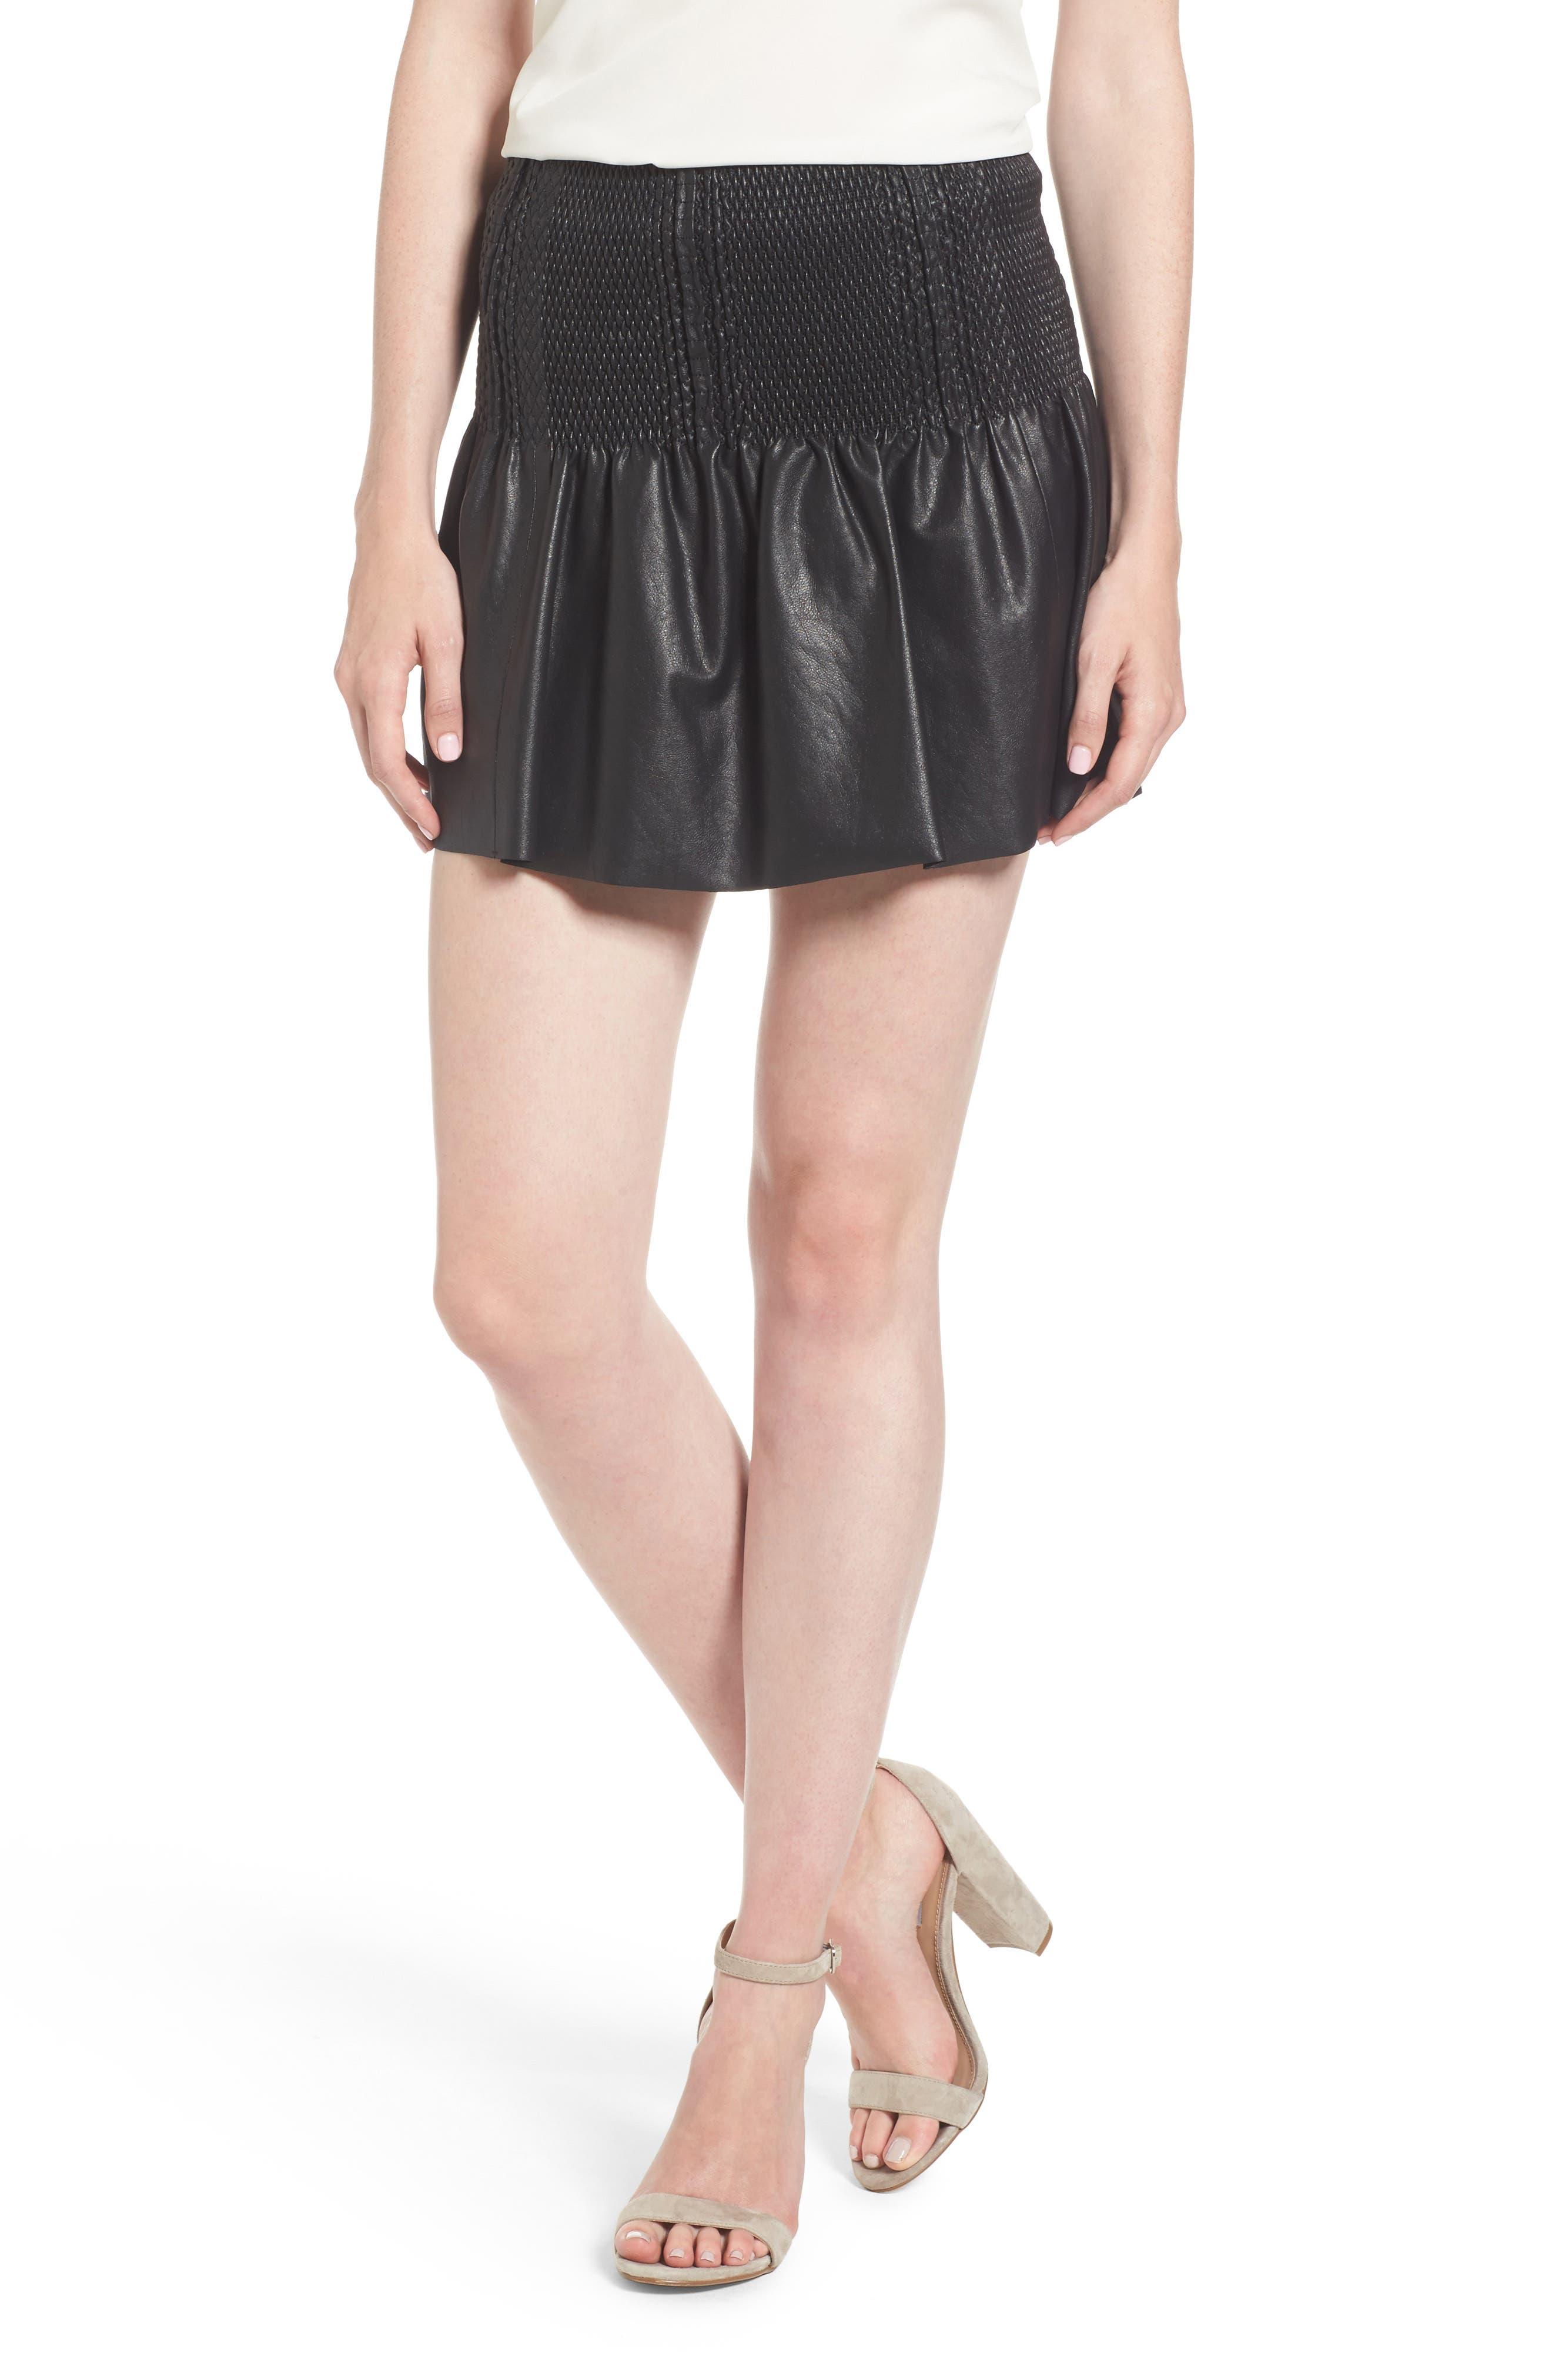 Ella Moss Geela Smocked Skirt